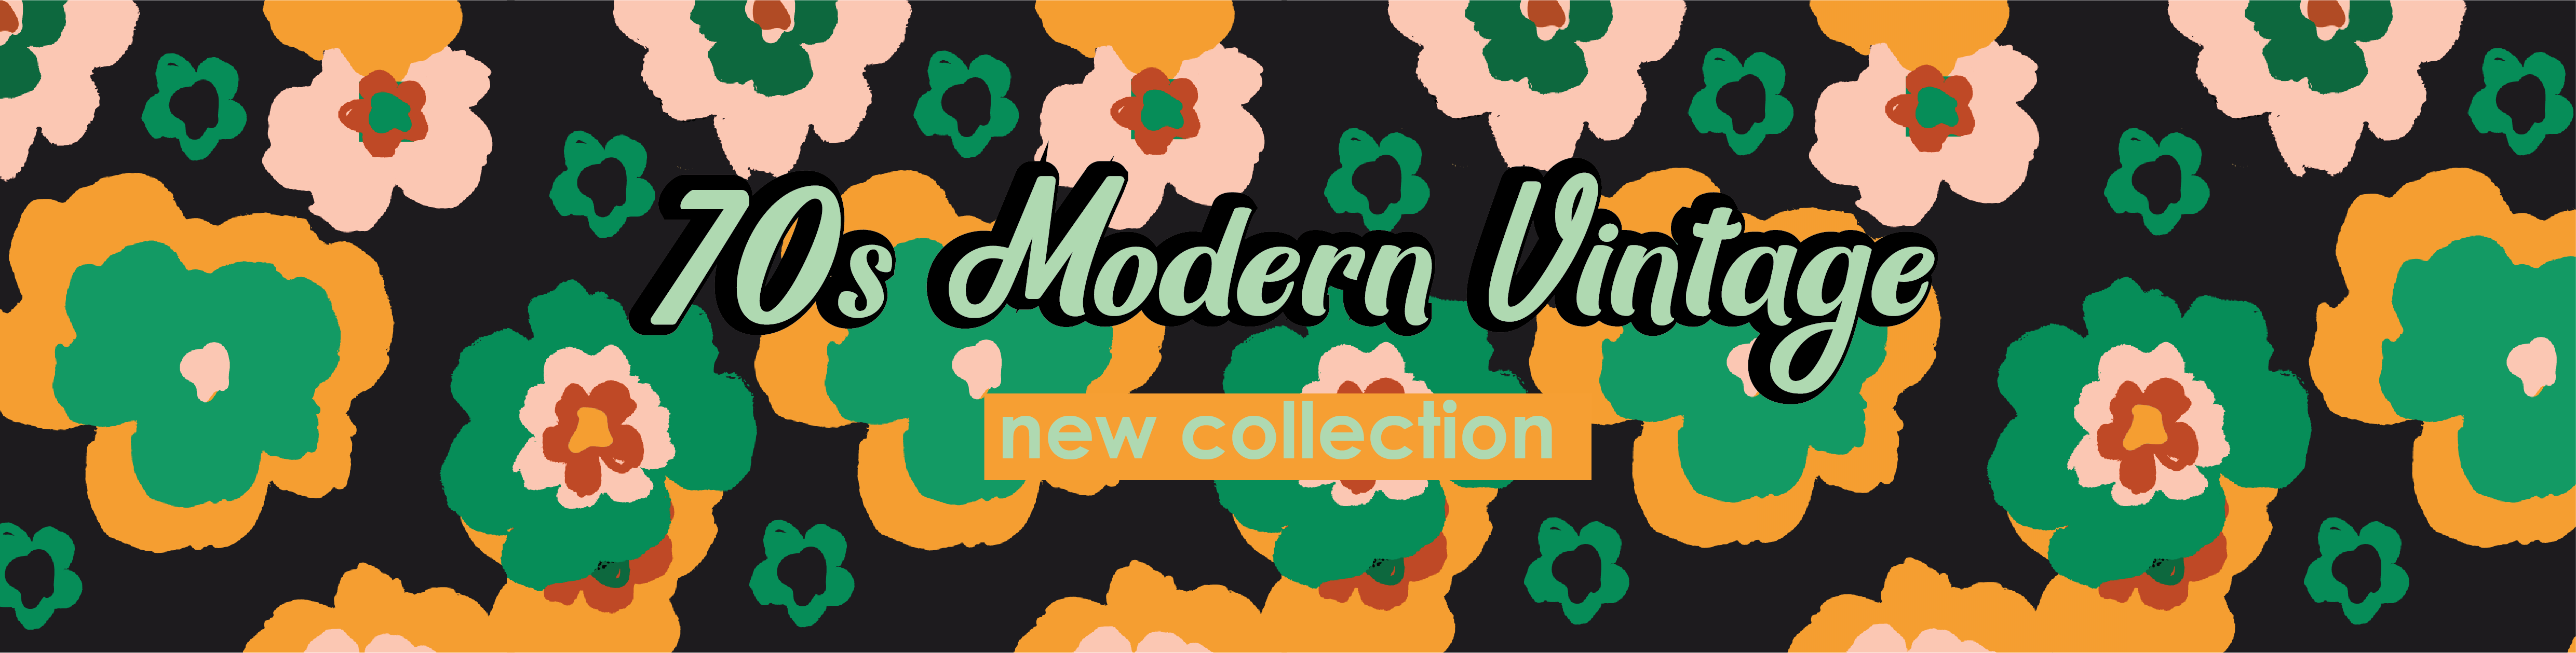 70s Modern Vintage Flower